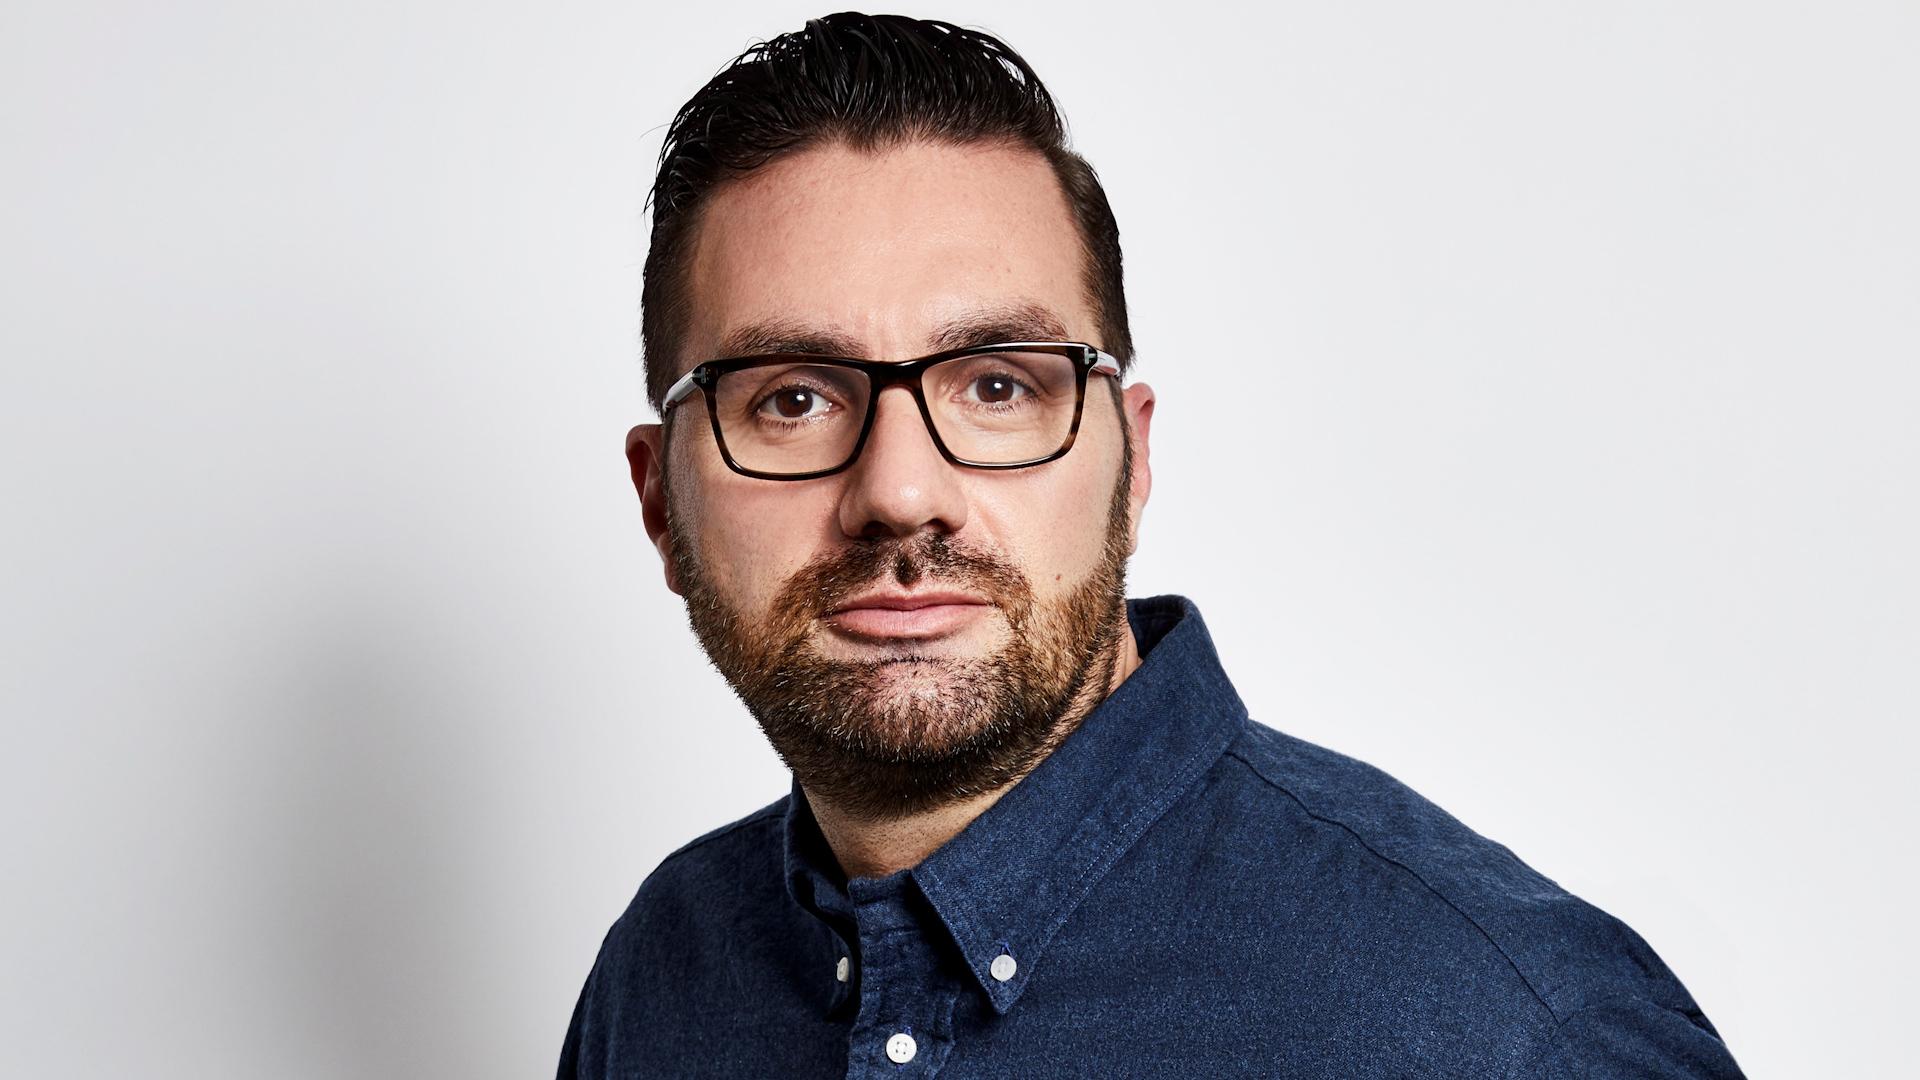 Damian Burns, Vicepresidente de Twitch